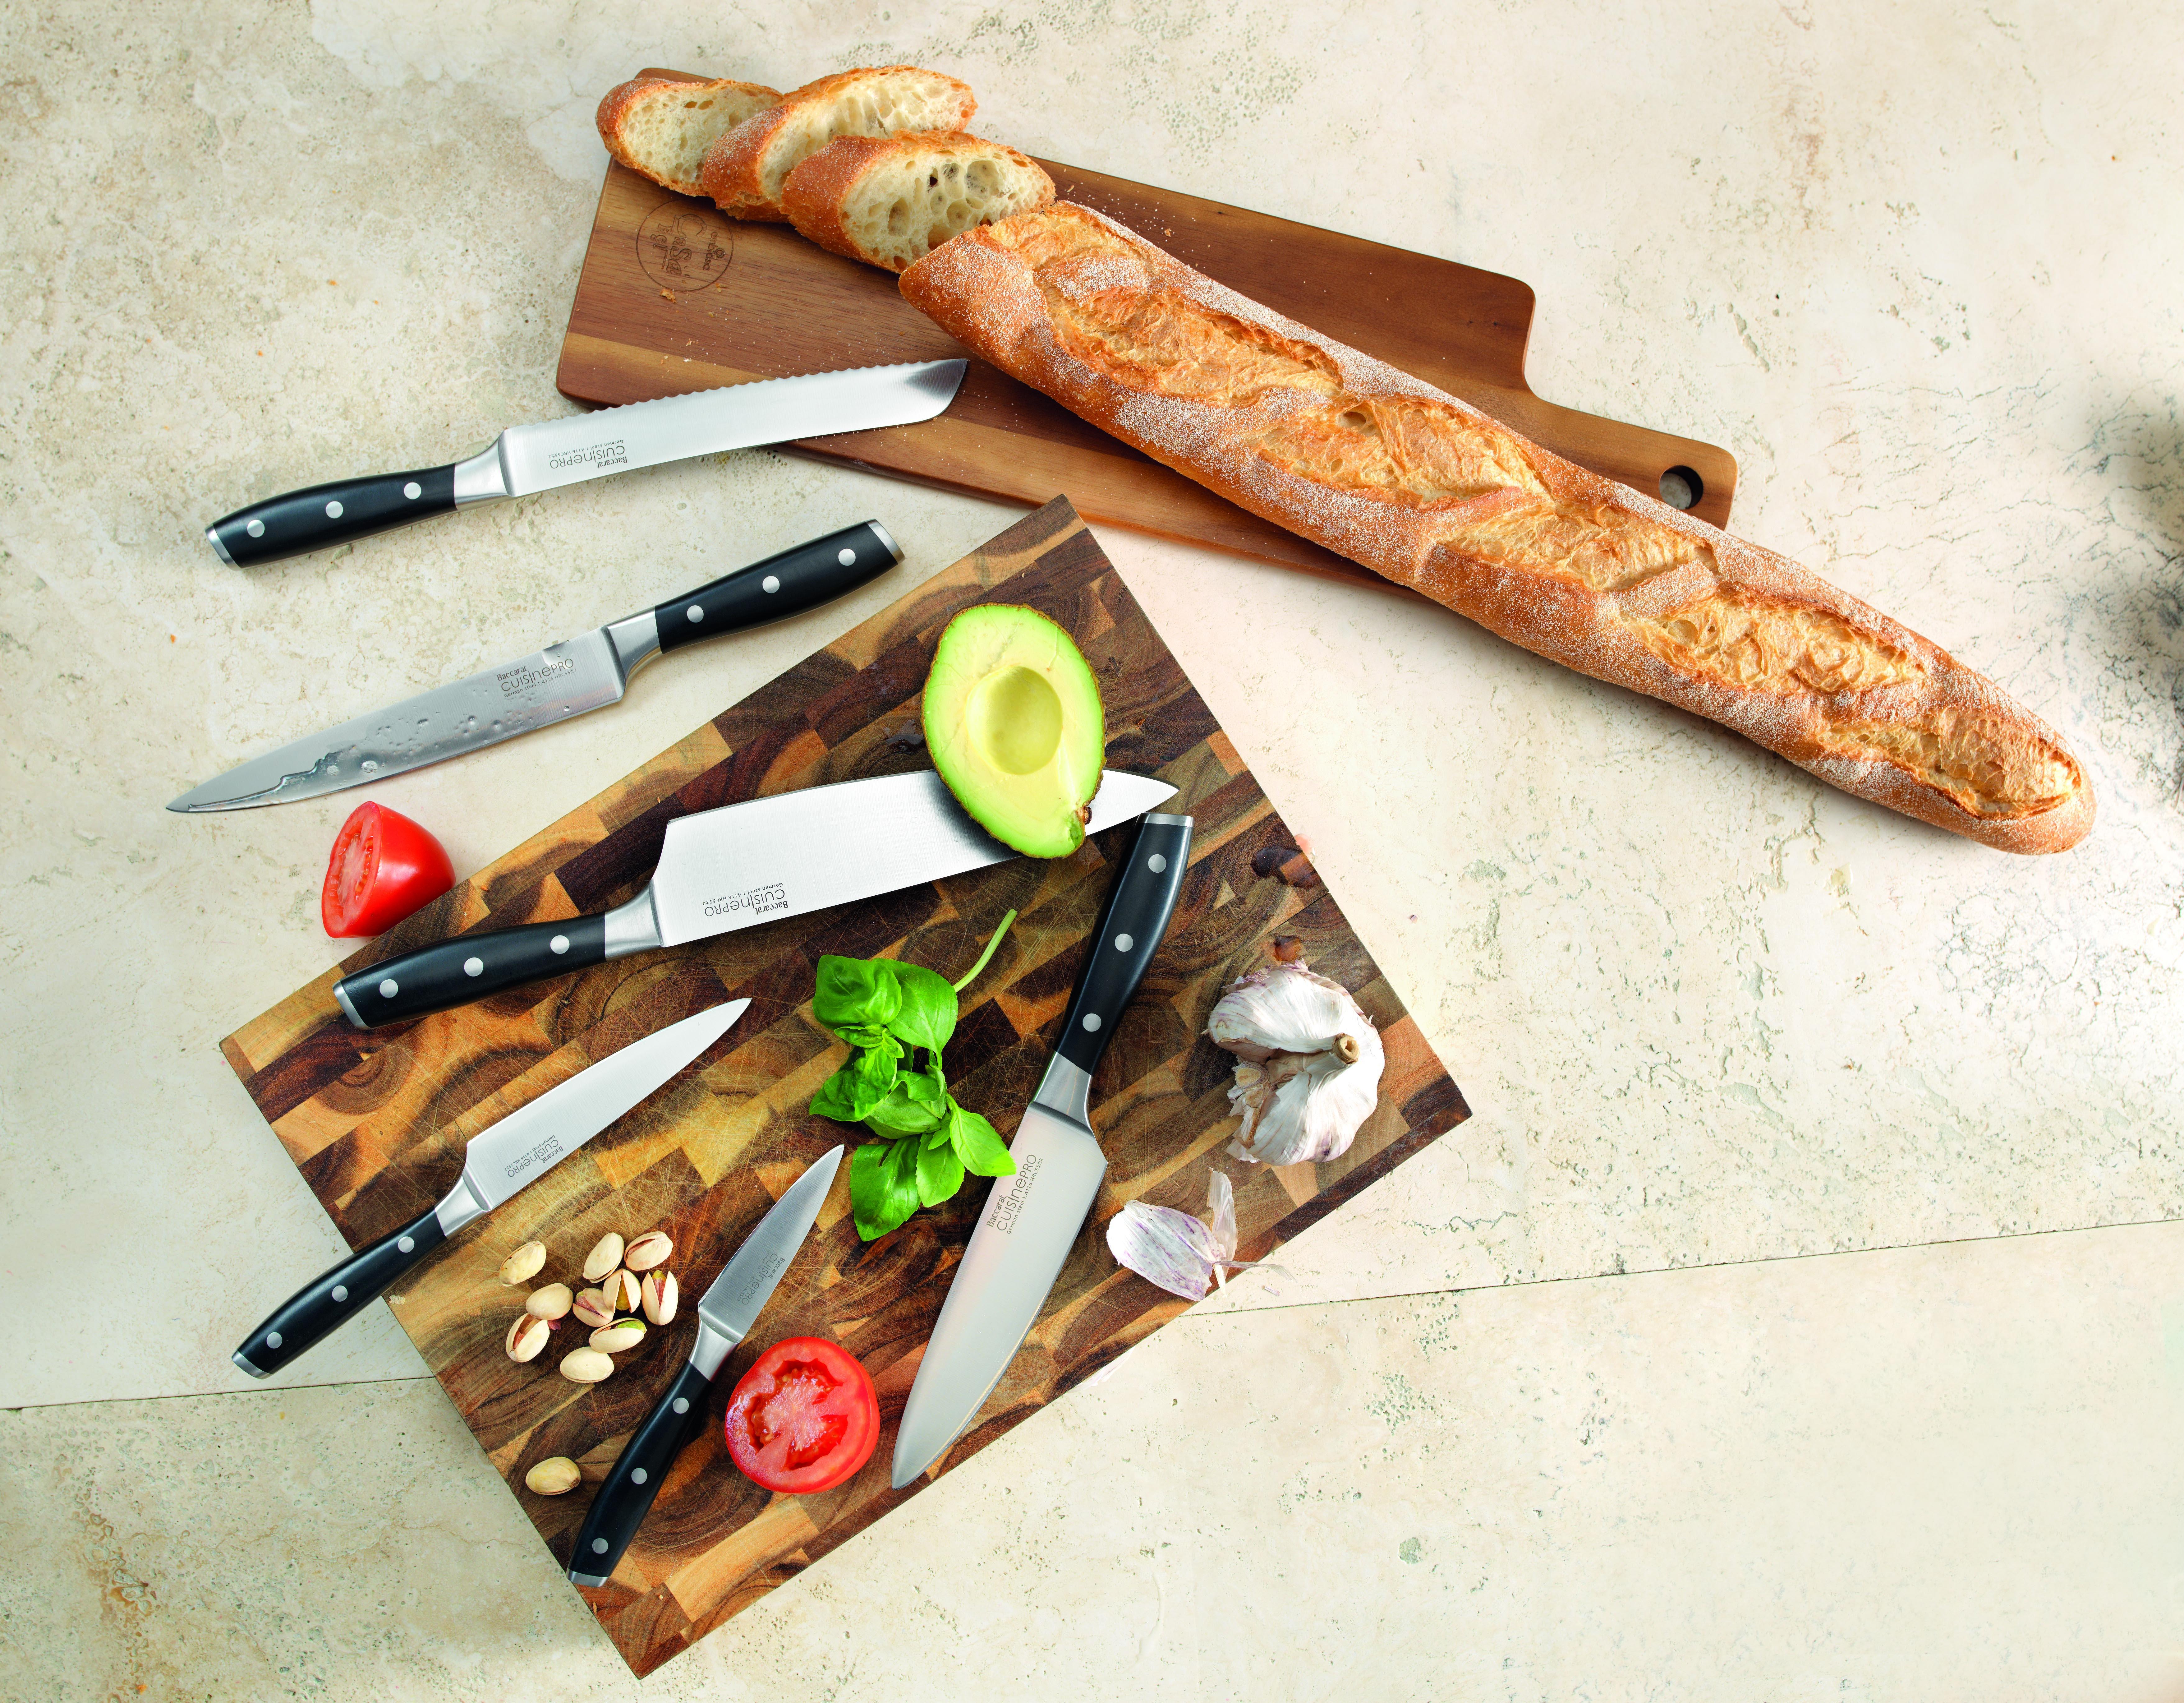 Cuisine Pro Knives_0010